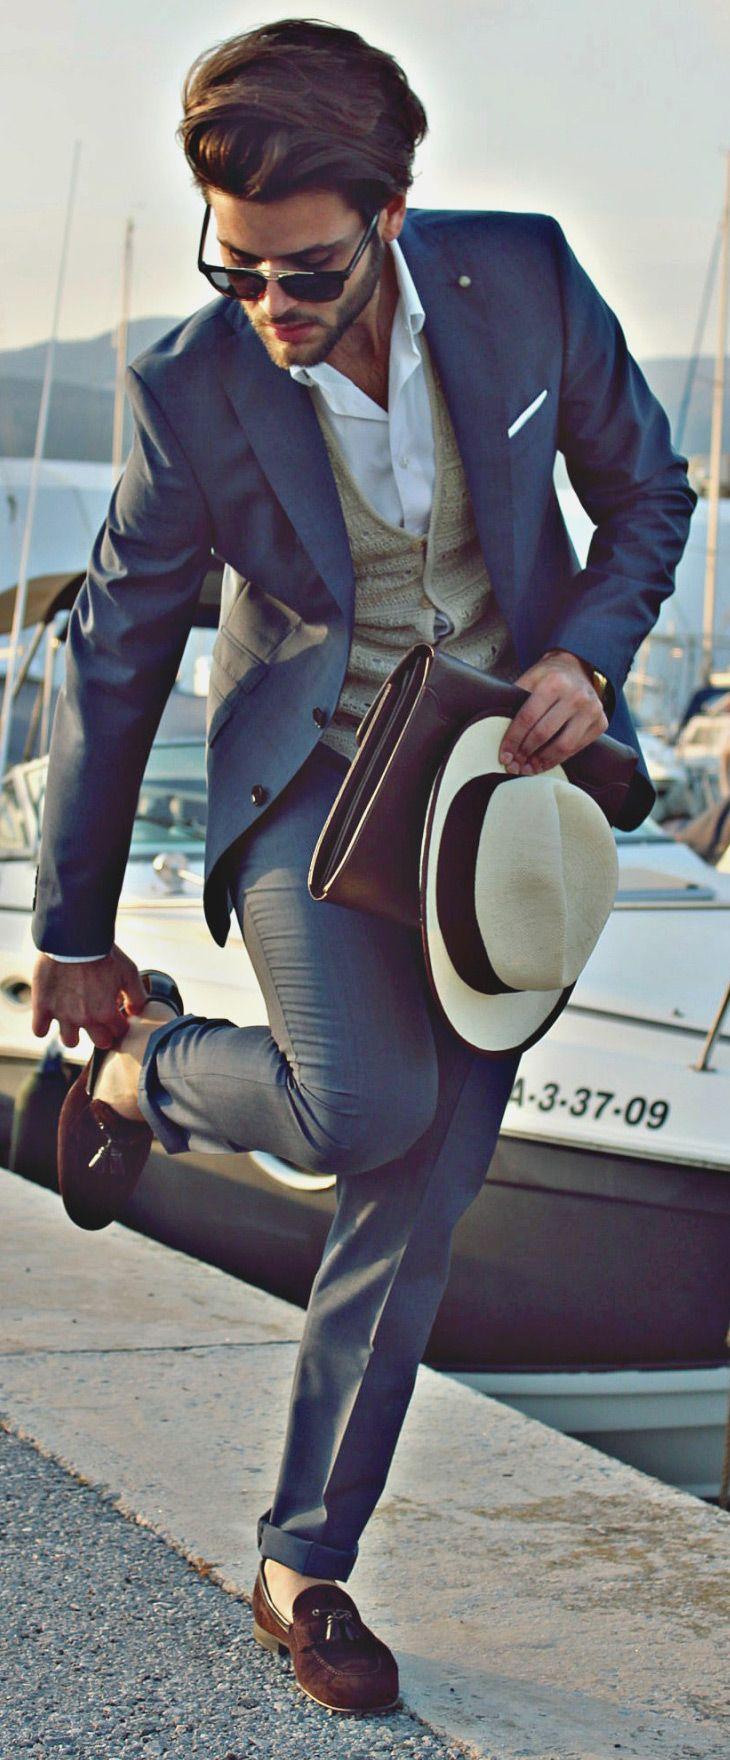 Summer Style | Mens Fashion Magazine https://twitter.com/faefmgaifnae/status/895102947775750144